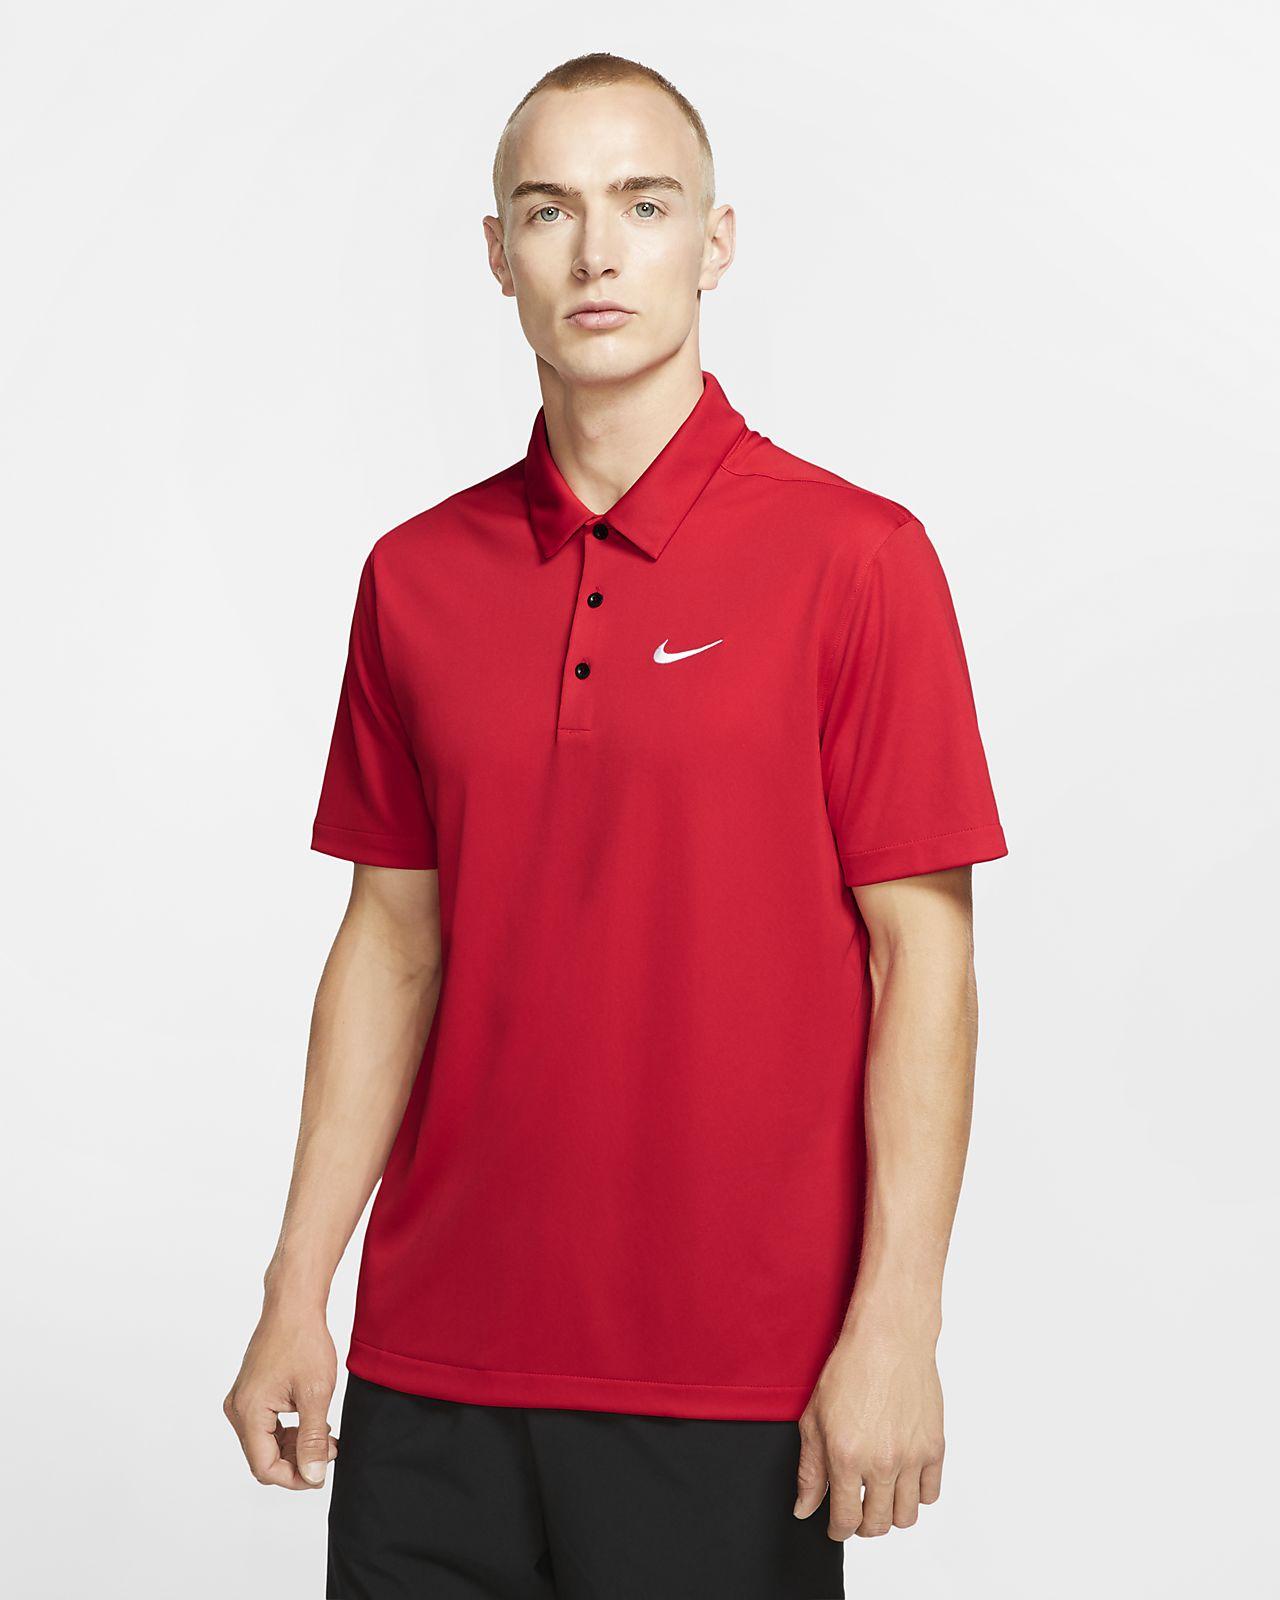 nike polo mens shirts